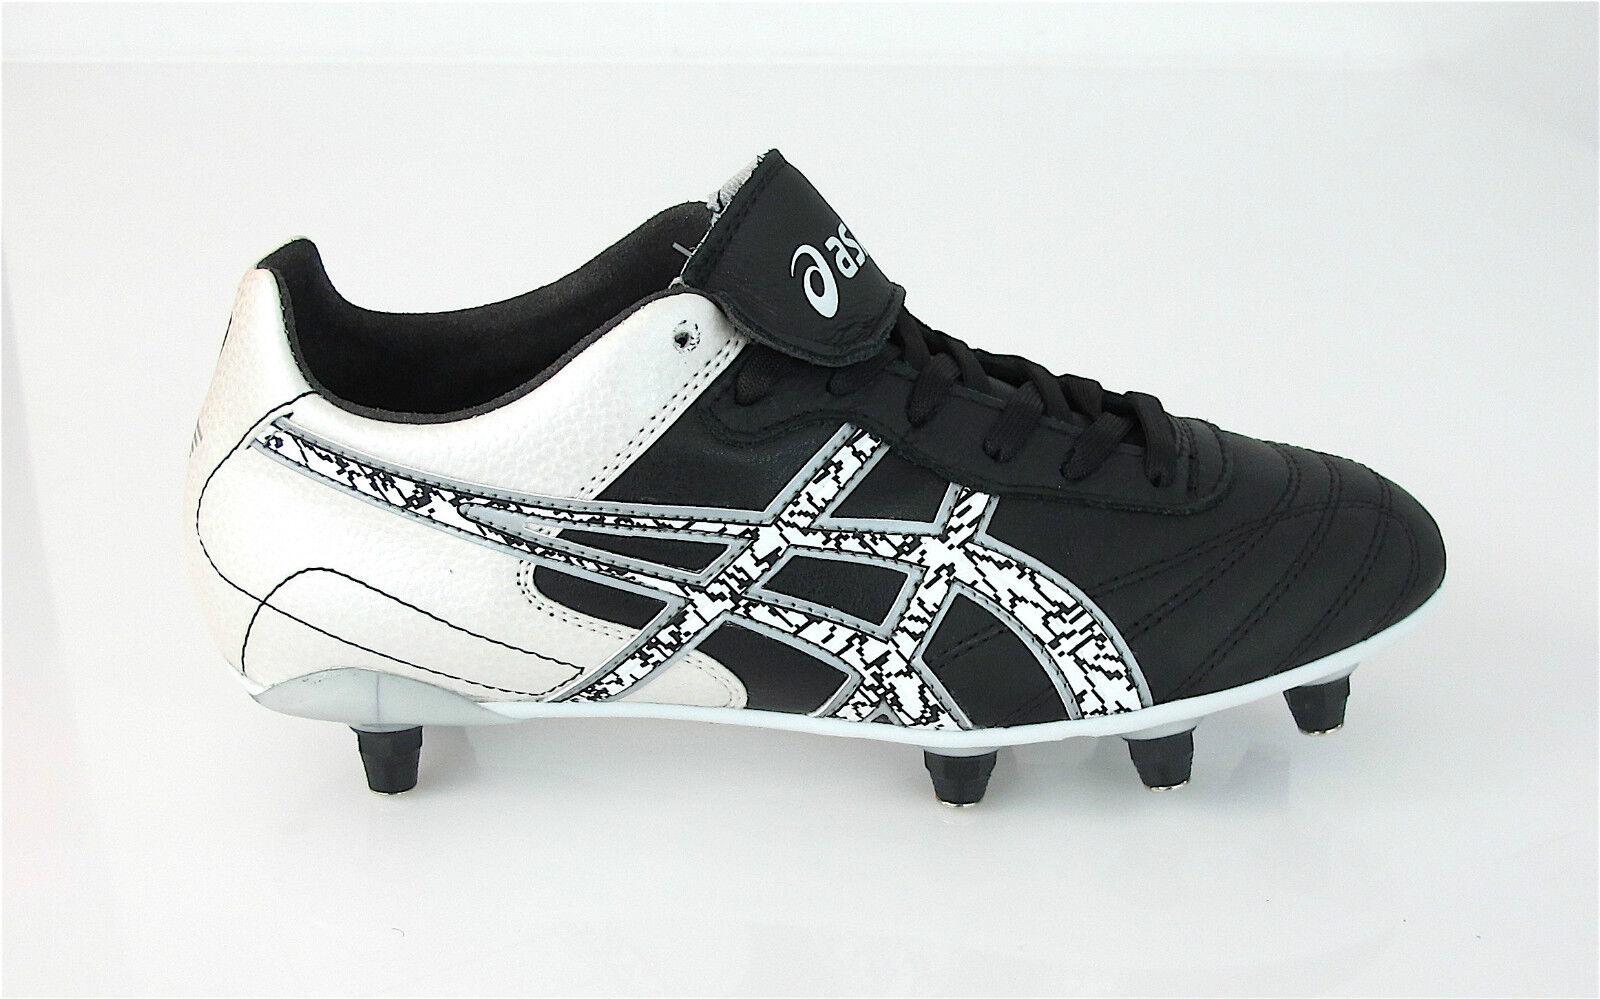 ASICS shoes calcio mod.NIPPON ST 140651 9001 col.BIANCO black luglio 2016